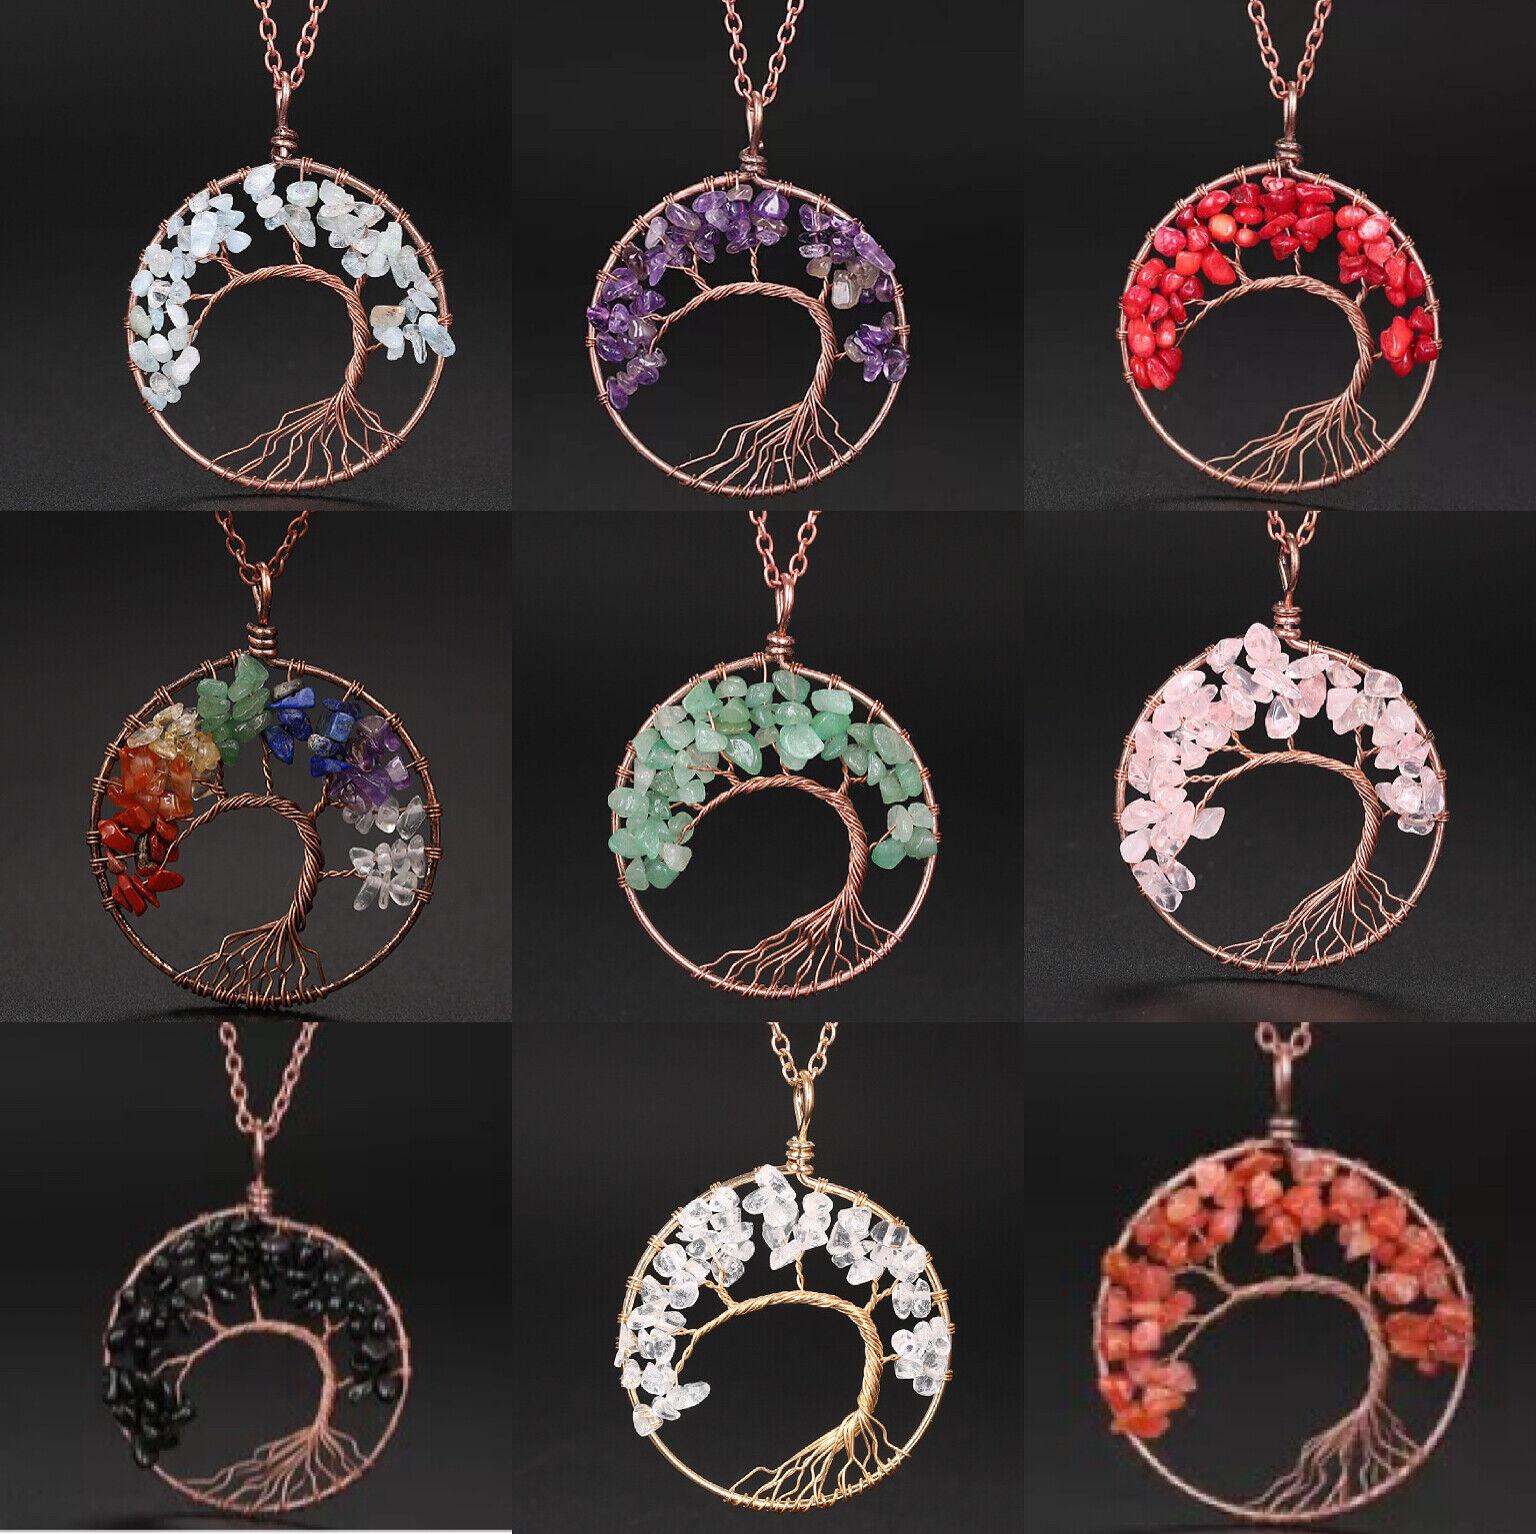 Jewellery - Pendant Necklace Natural Gemstone Tree of Life 7 Chakra Healing Crystal Charm